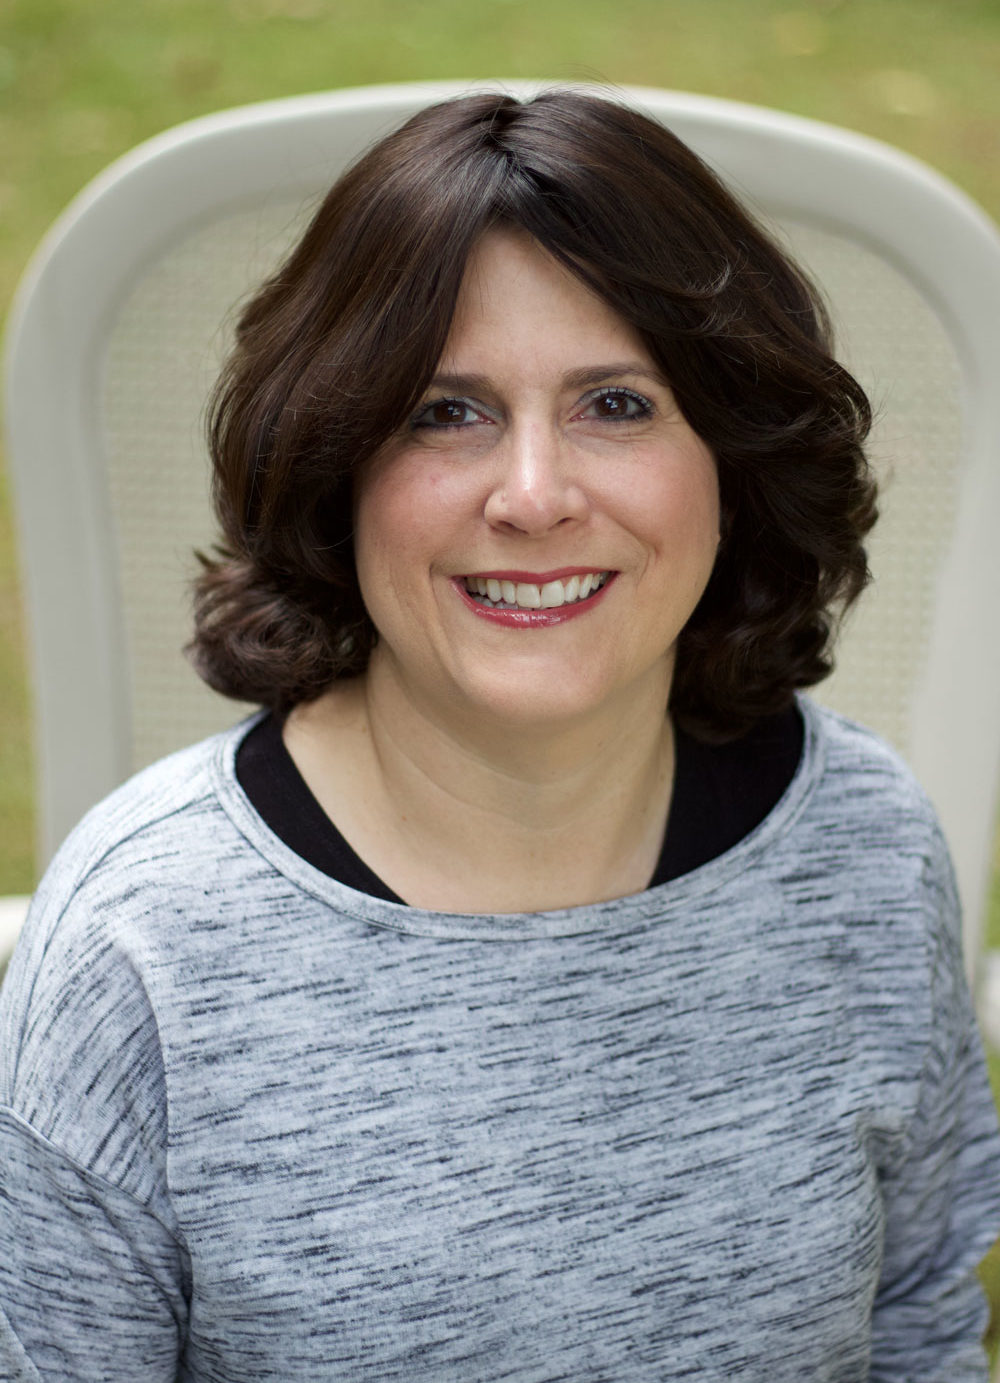 Julie Farkas